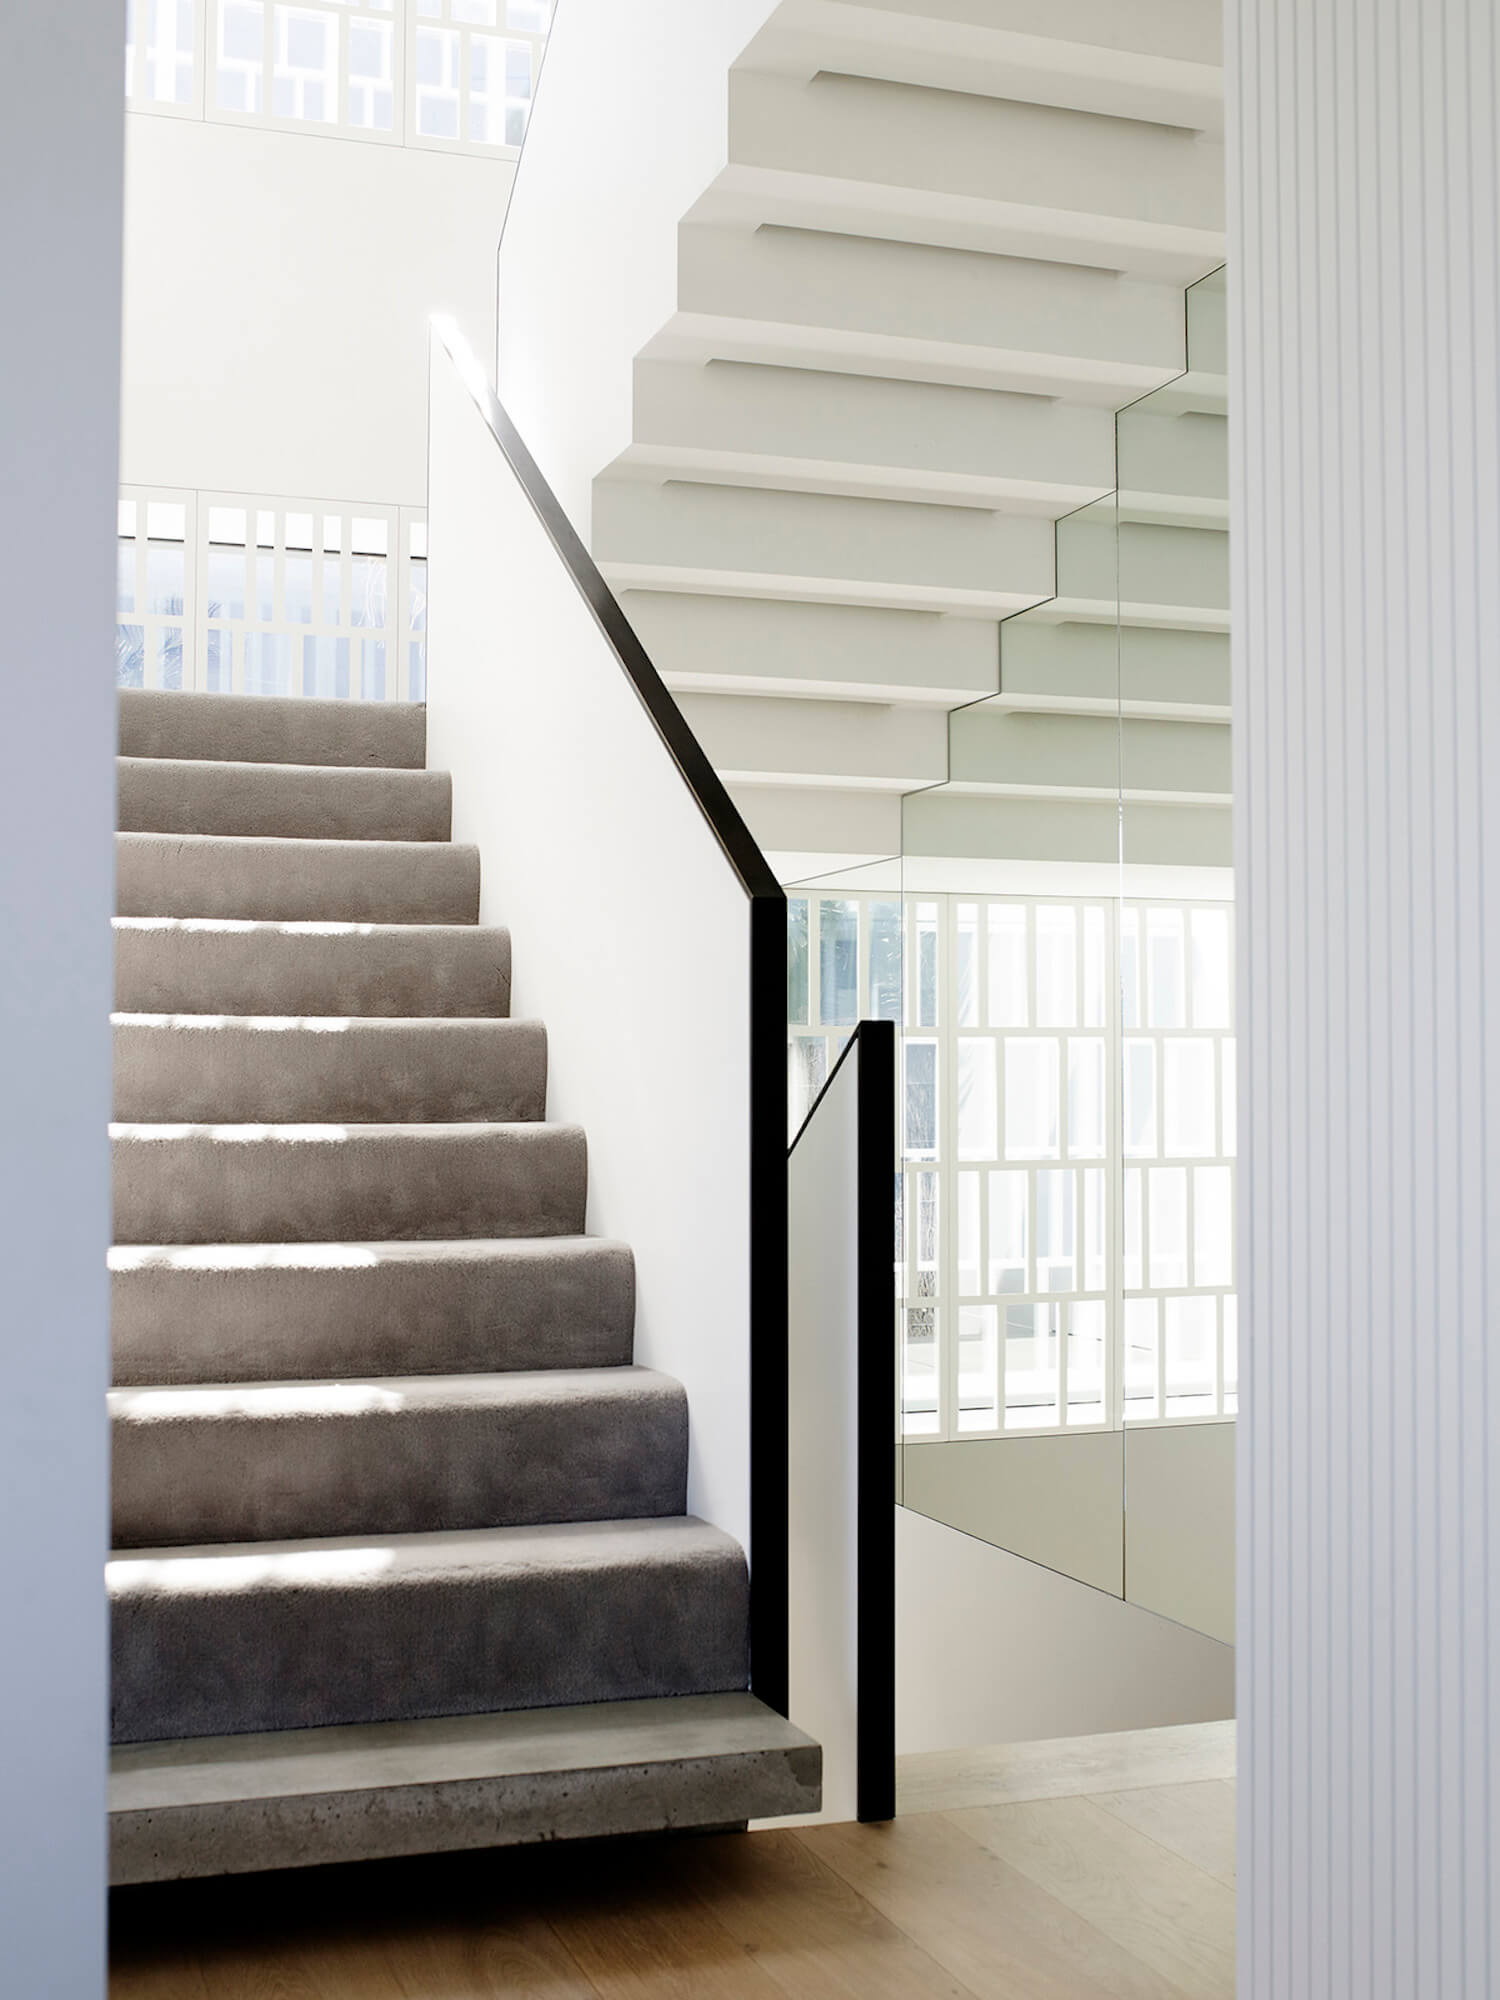 est living clovelly house II madeleine blanchfield architects 5